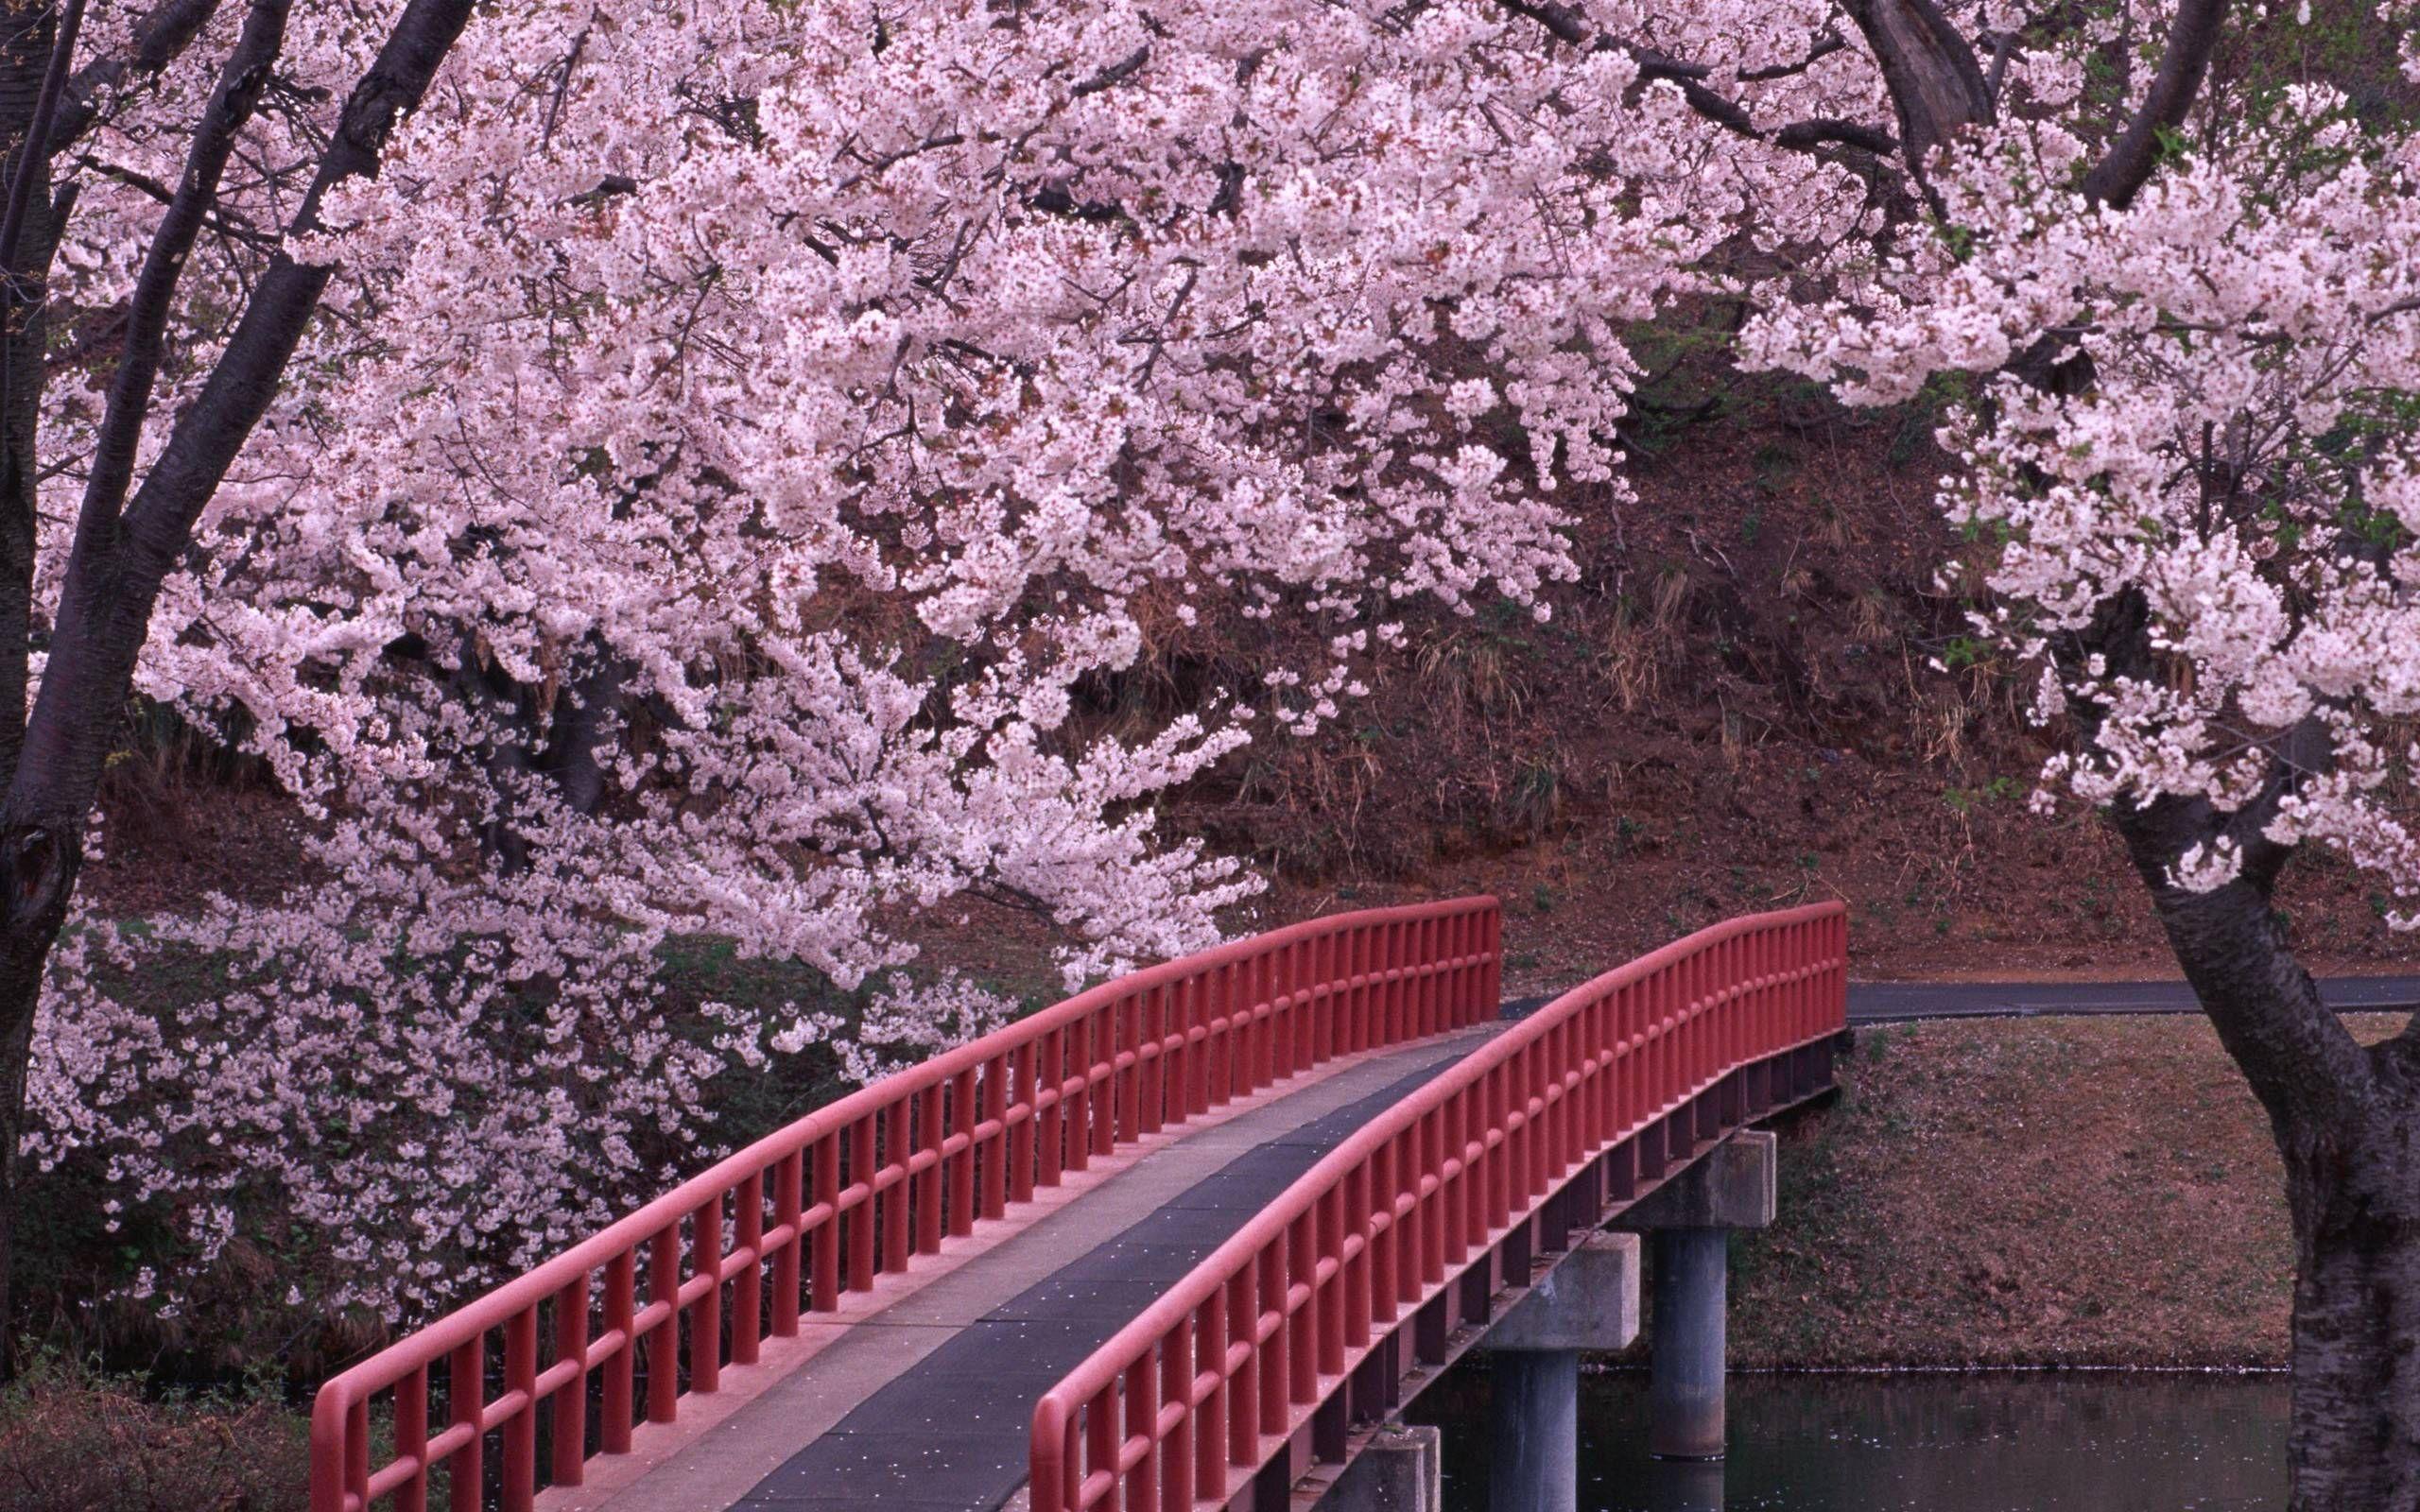 Sakura Tree Wallpaper 1080p Cherry Blossom Wallpaper Anime Cherry Blossom Spring Flowers Wallpaper